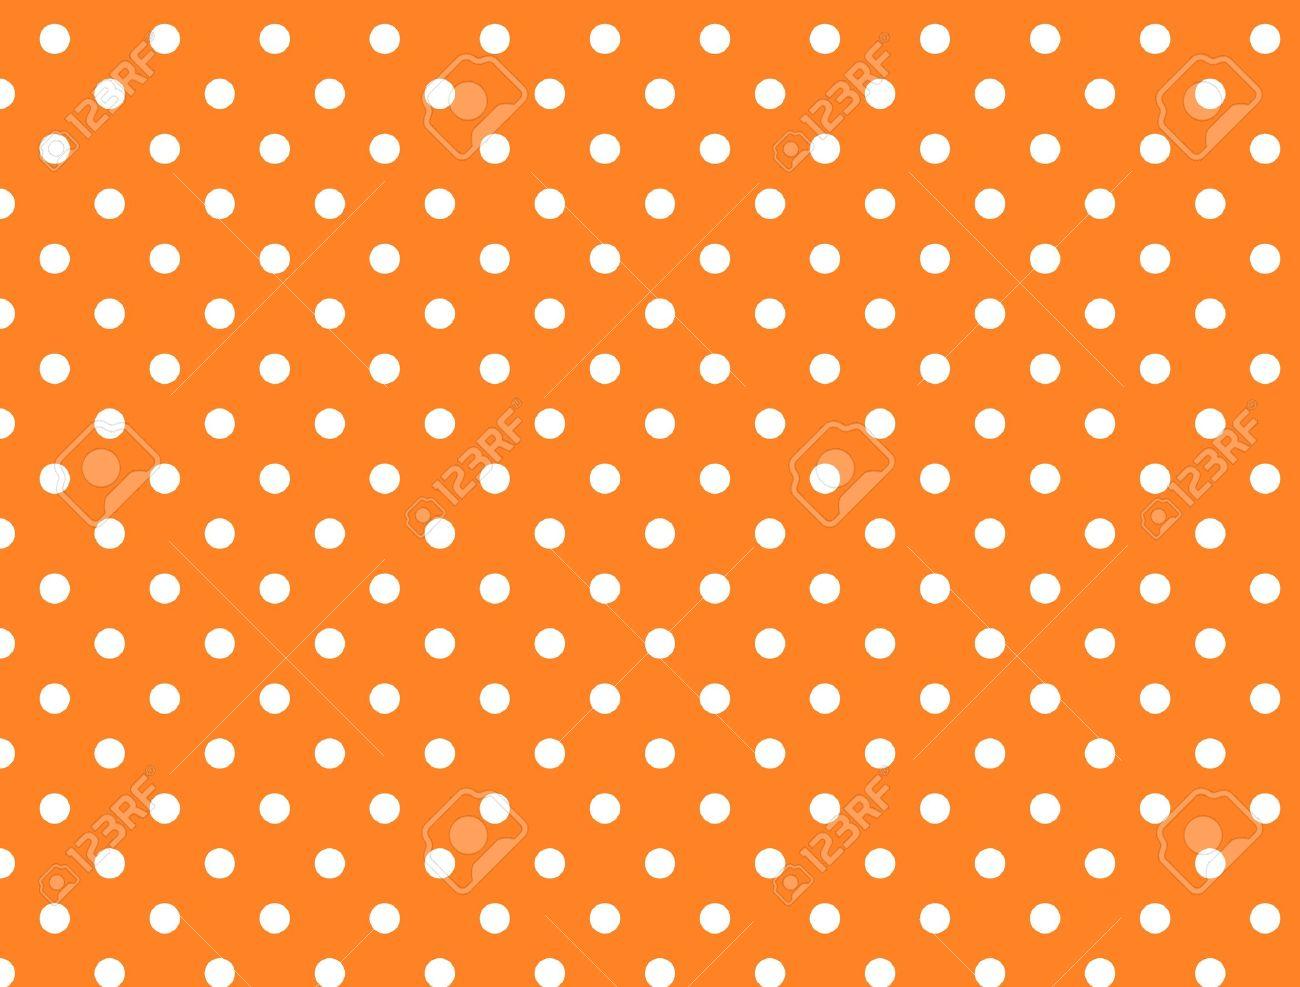 Orange background with white polka dots. - 6803391